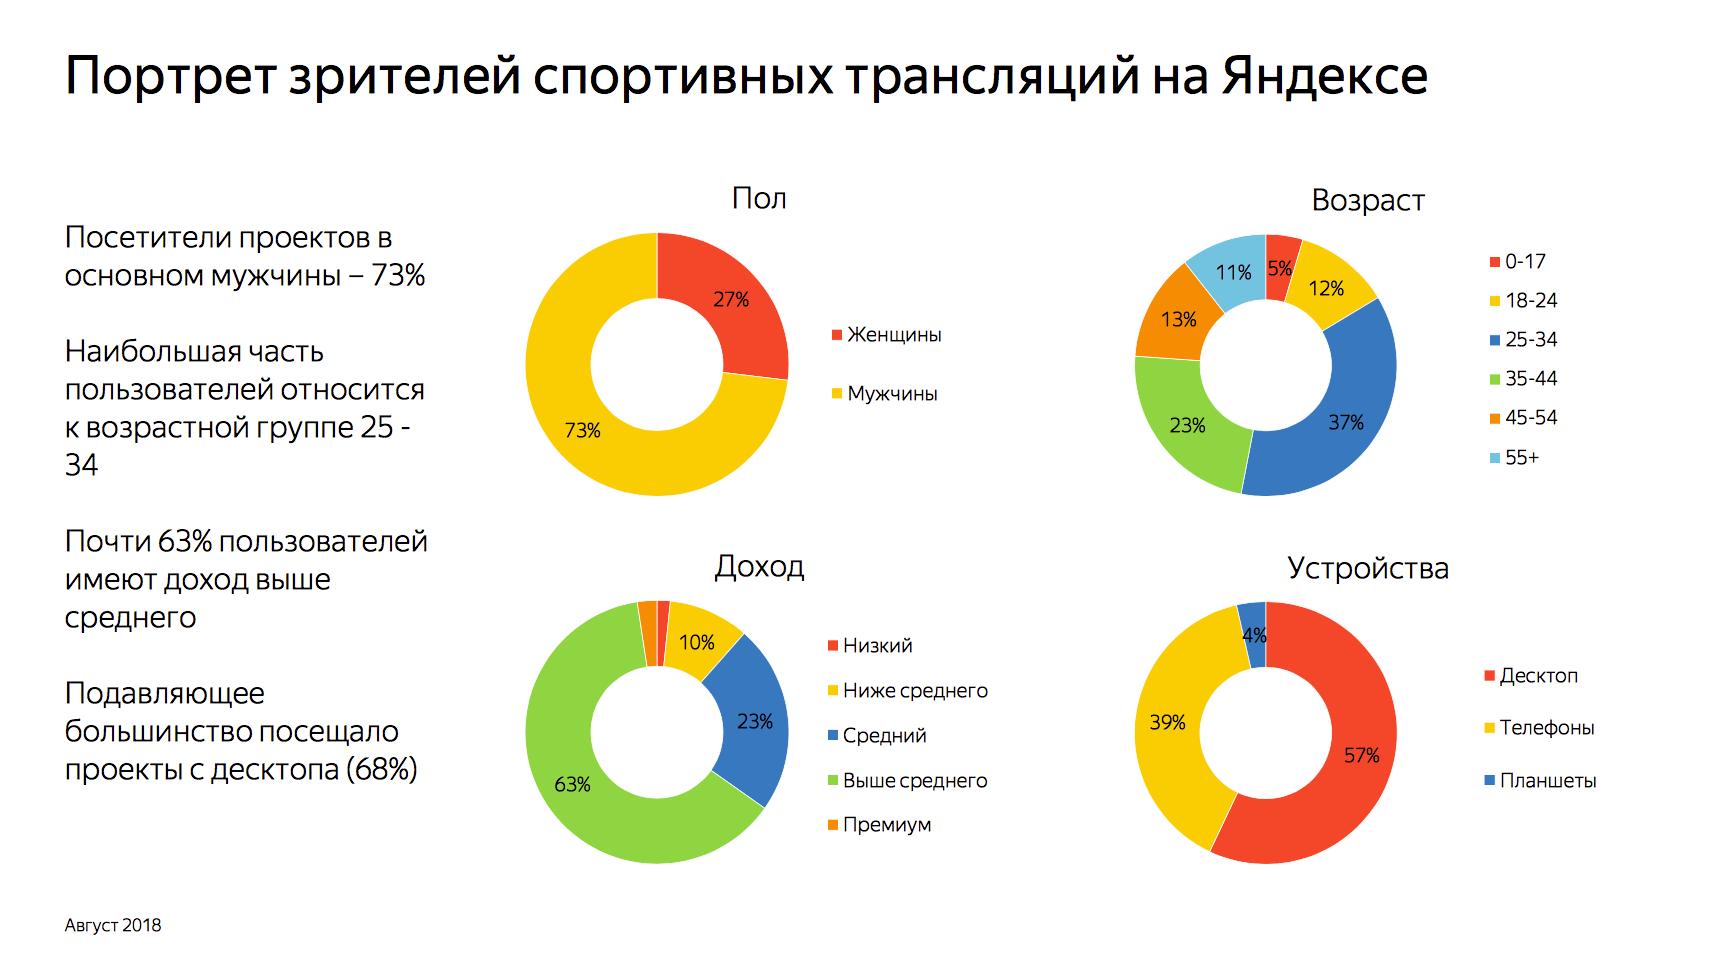 Портрет зрителей спортивных трансляций на Яндексе